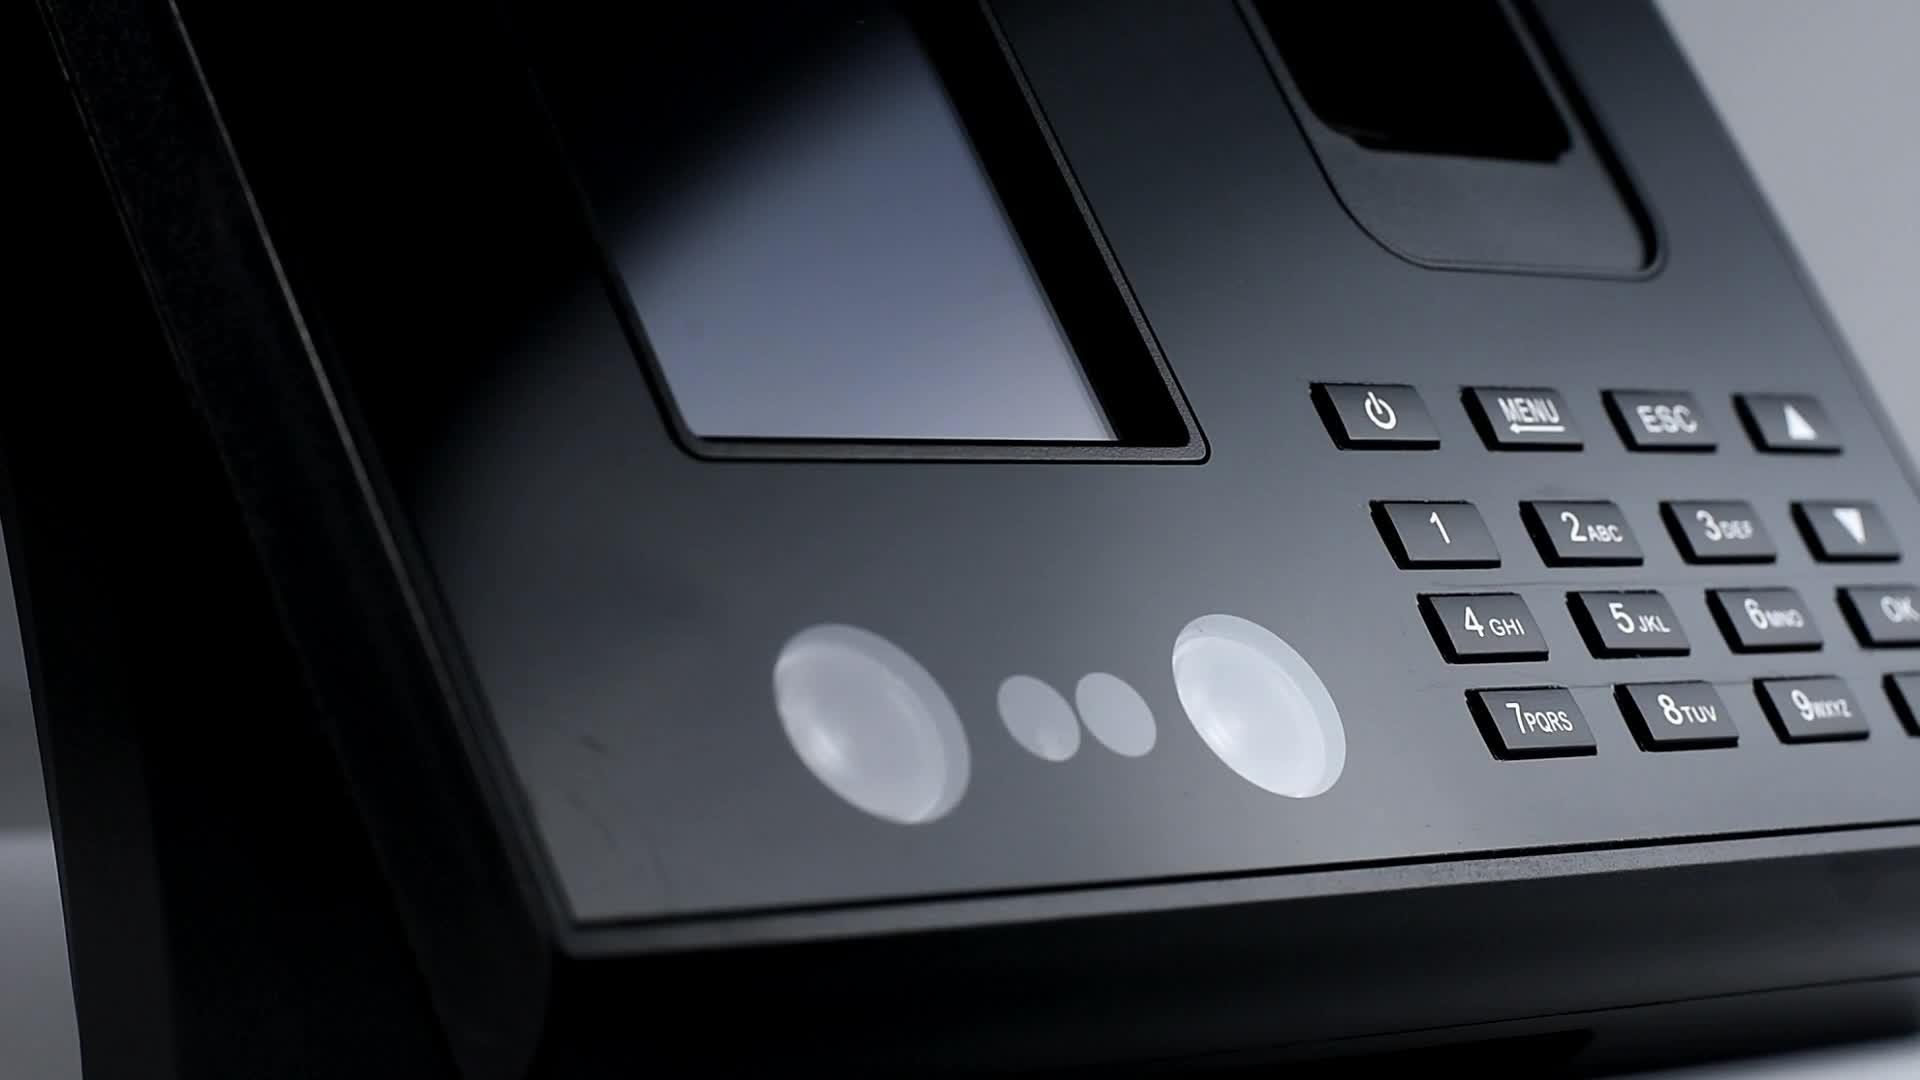 EseyeโรงงานราคาWIFIเว็บแบบพกพาBiometricลายนิ้วมือใบหน้ากล้องตรวจจับเวลานาฬิการะบบเข้าร่วม